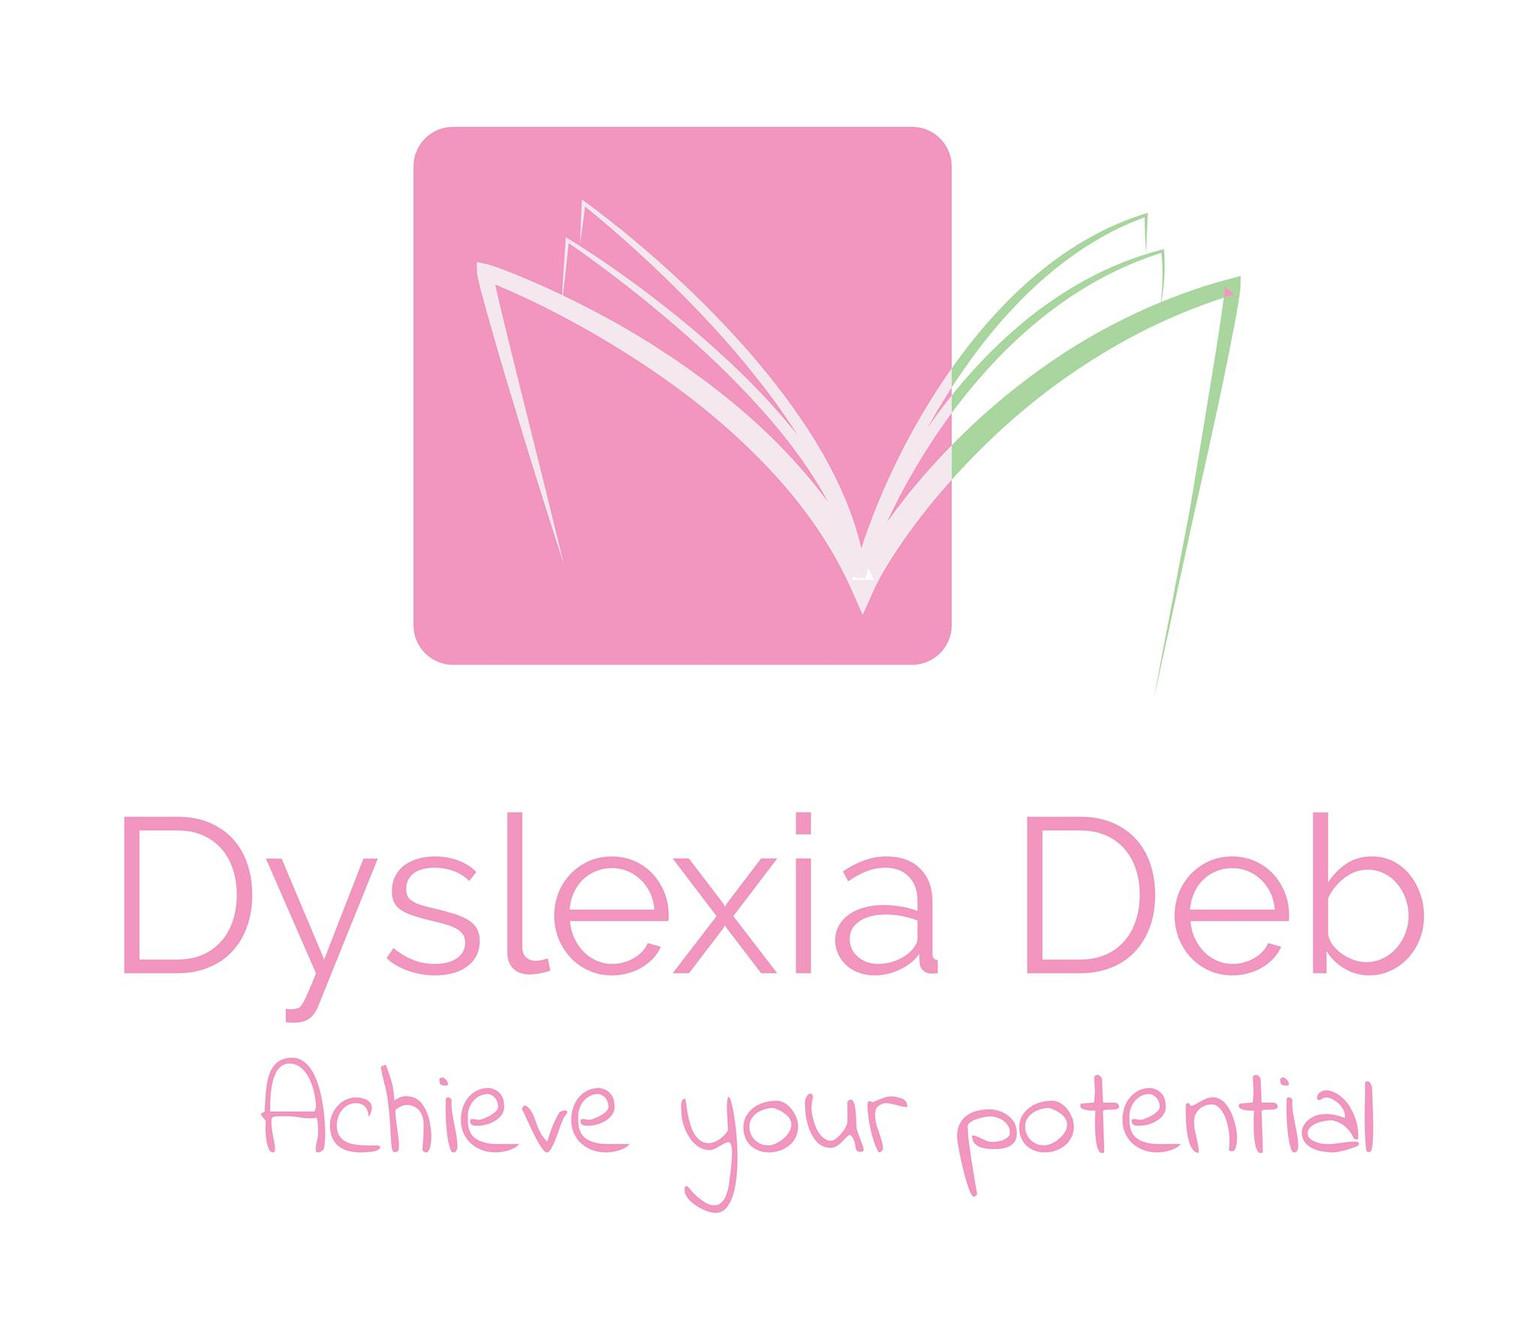 Dyslexia Deb   Dyslexia Advice   Dyslexia Tools for Parents